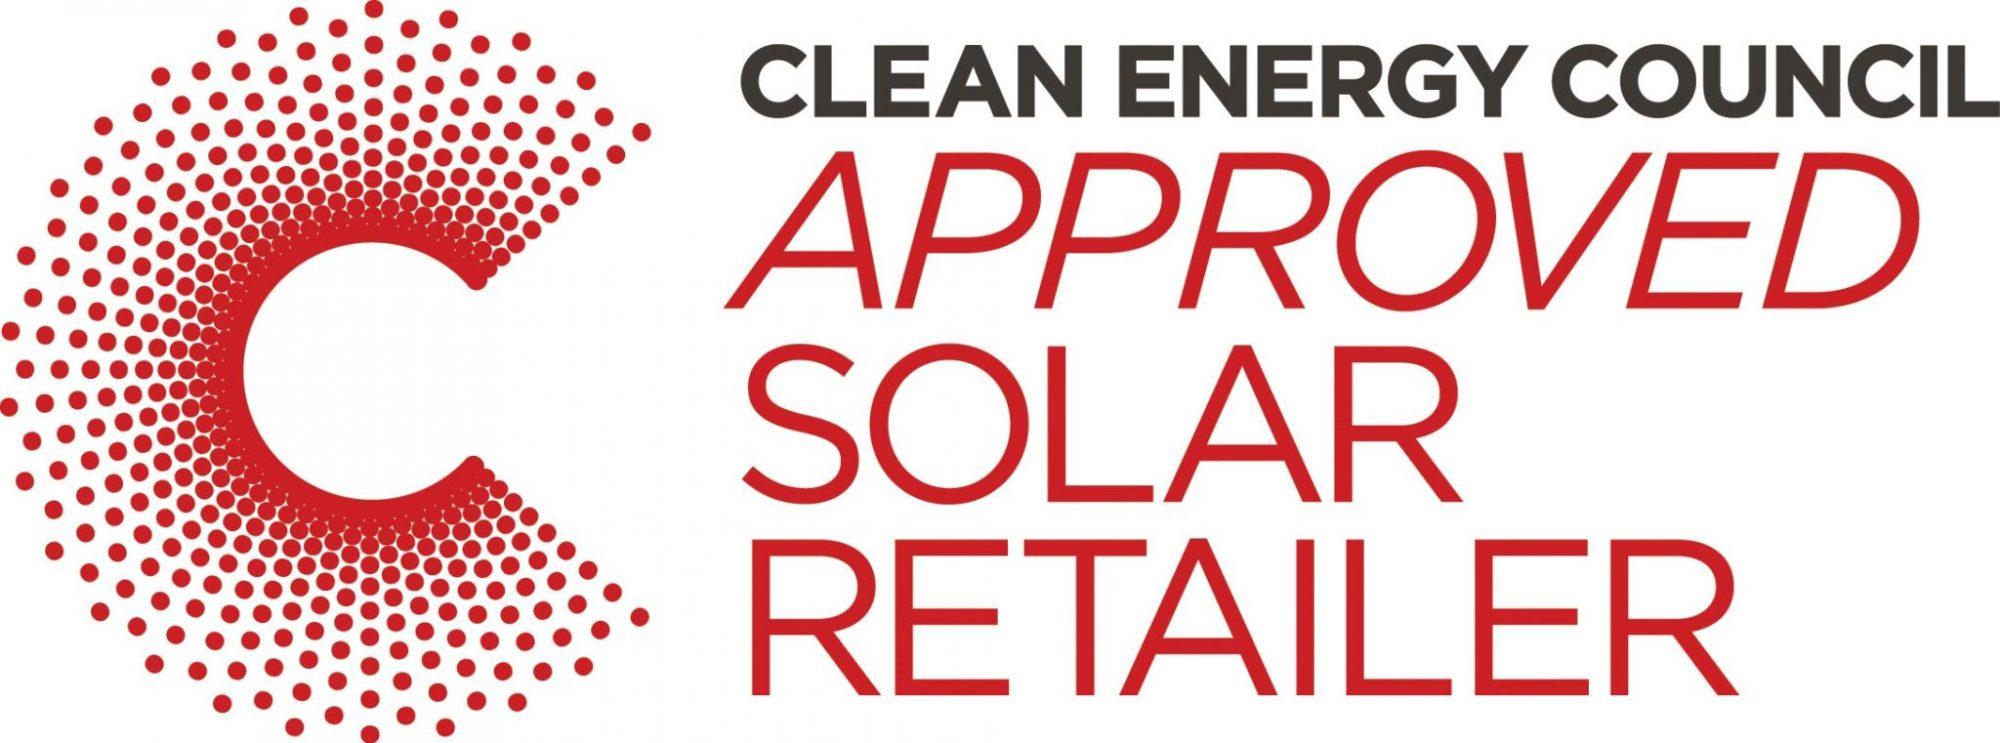 Big Sky Energy CEC Approved Retailer